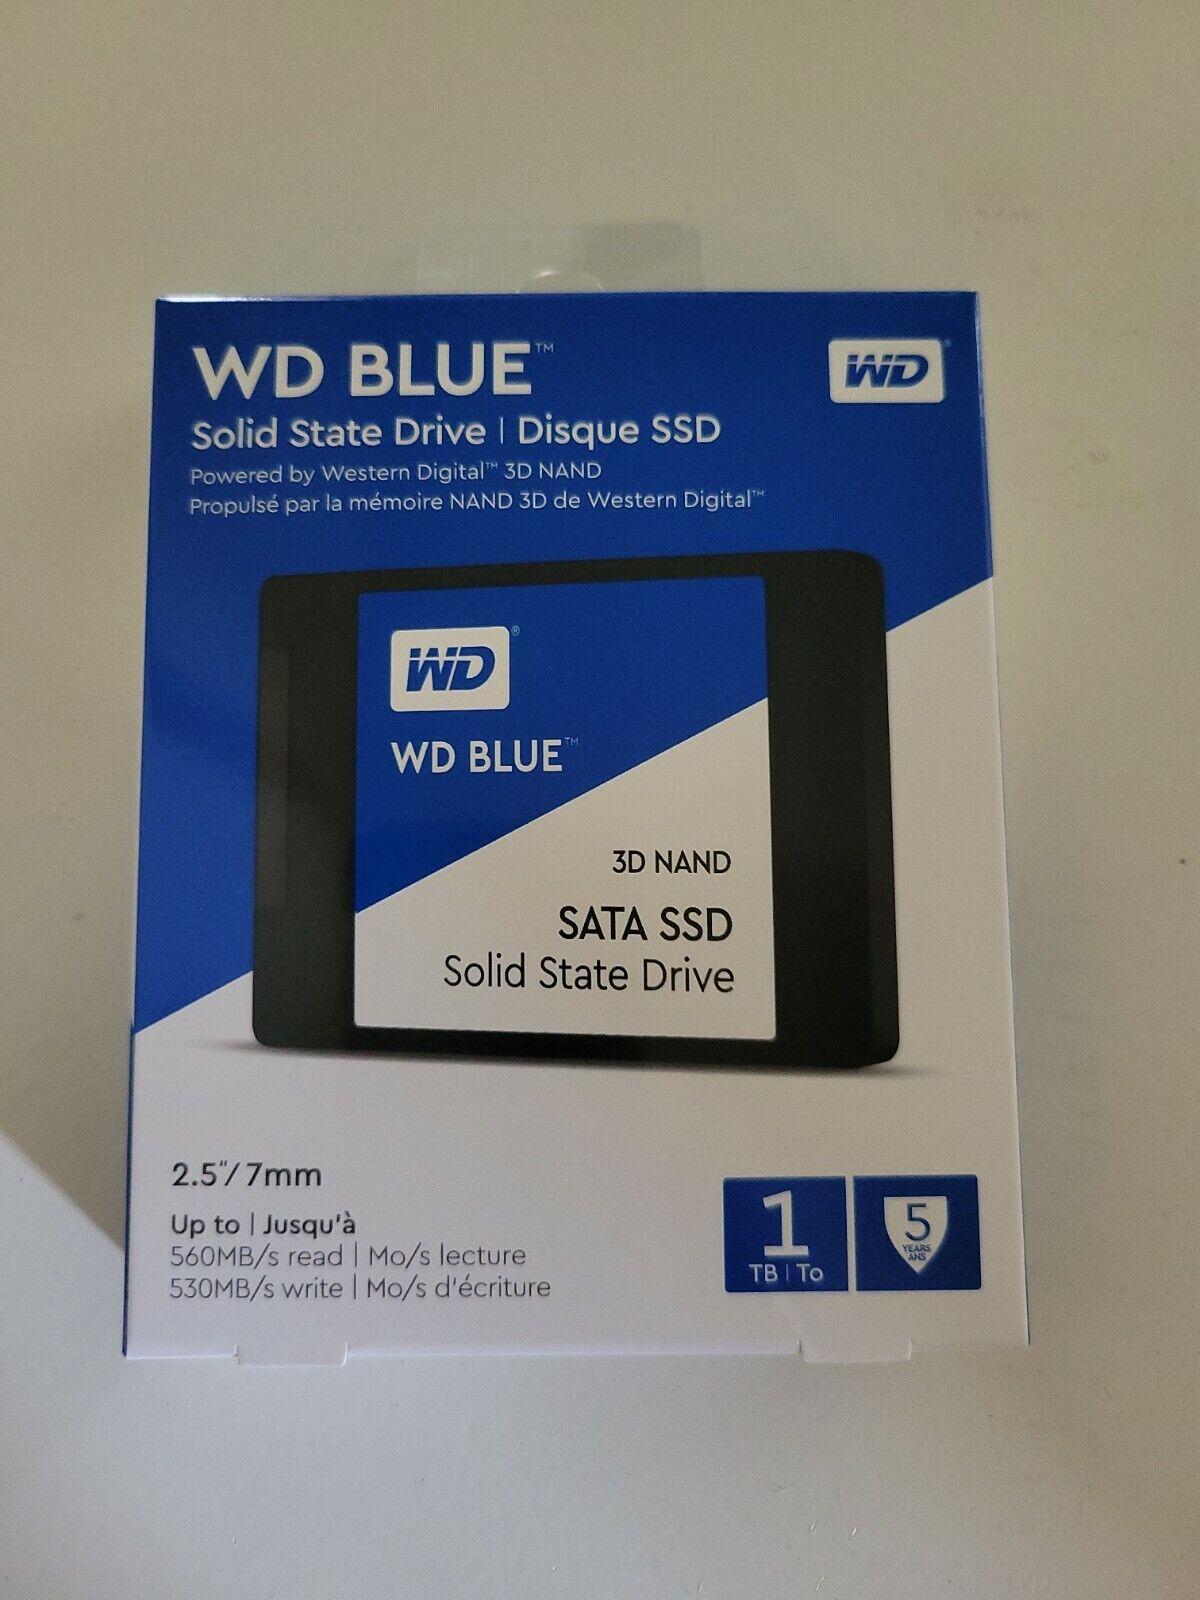 WD BLUE 1TB SOLID STATE DRIVE SSD WESTERN DIGITAL 2.5